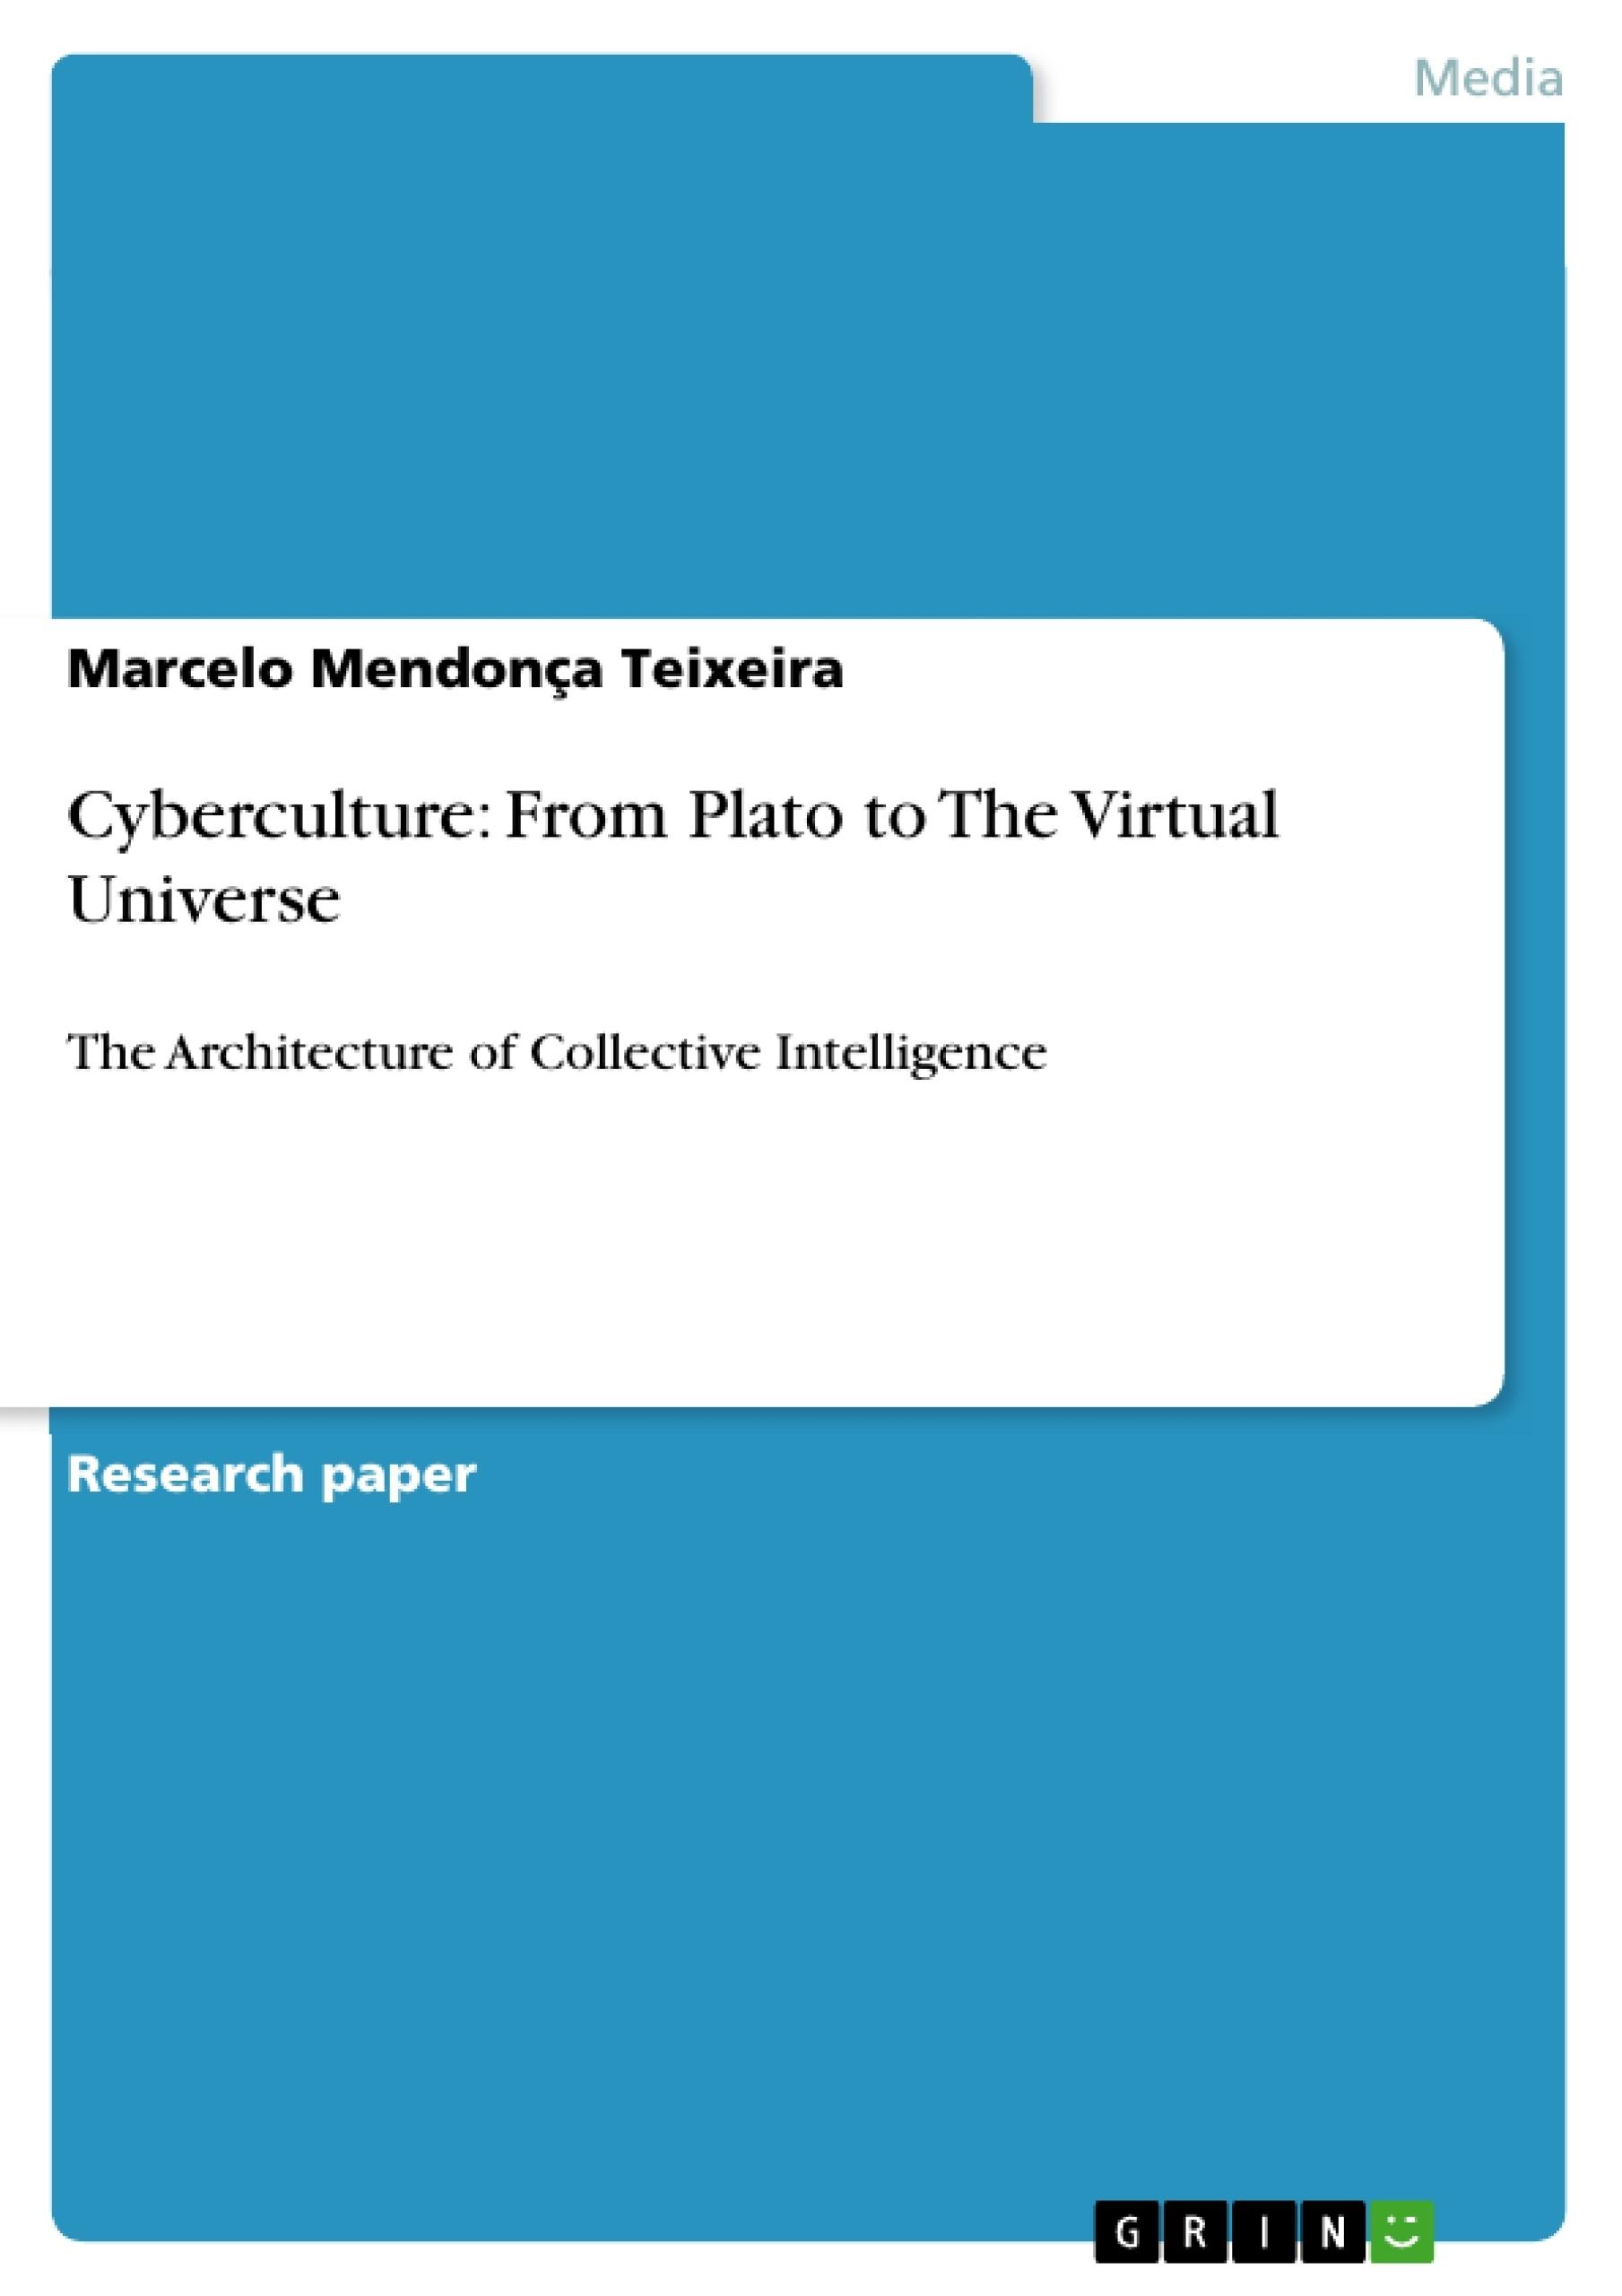 Title: Cyberculture: From Plato to The Virtual Universe